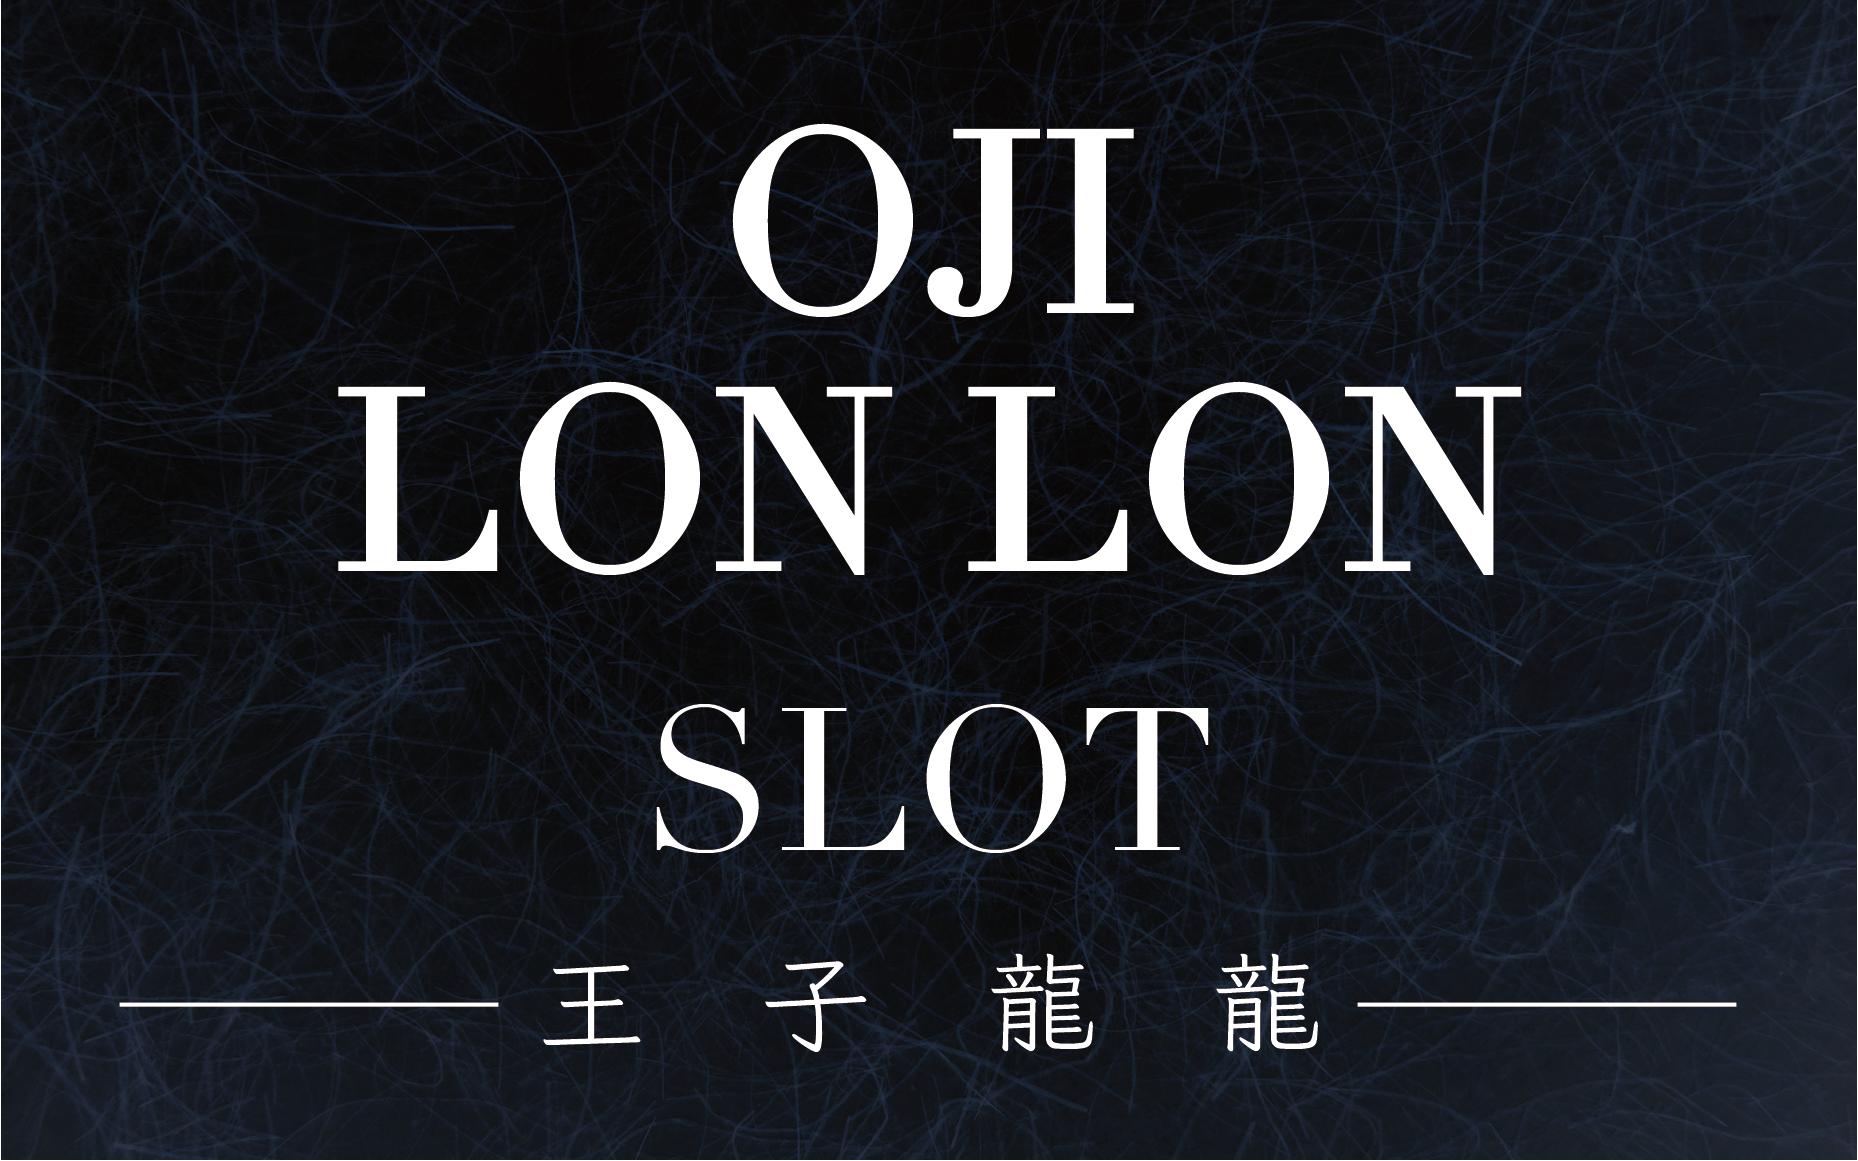 LON LON ロンロン 王子